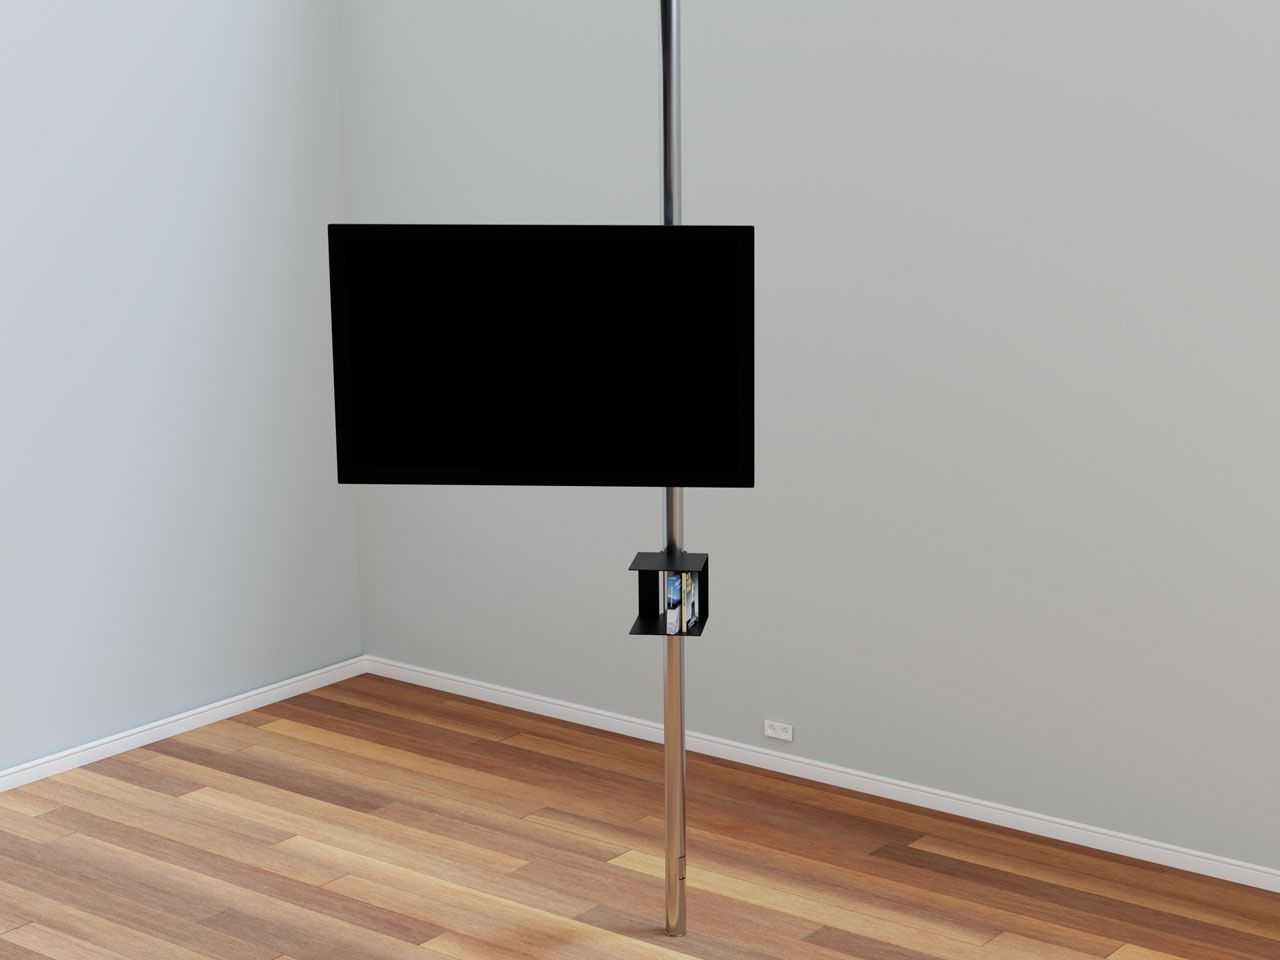 Boden Decken Tv Saule Slim Cmb 250 In 2020 Decken Boden Standfuss